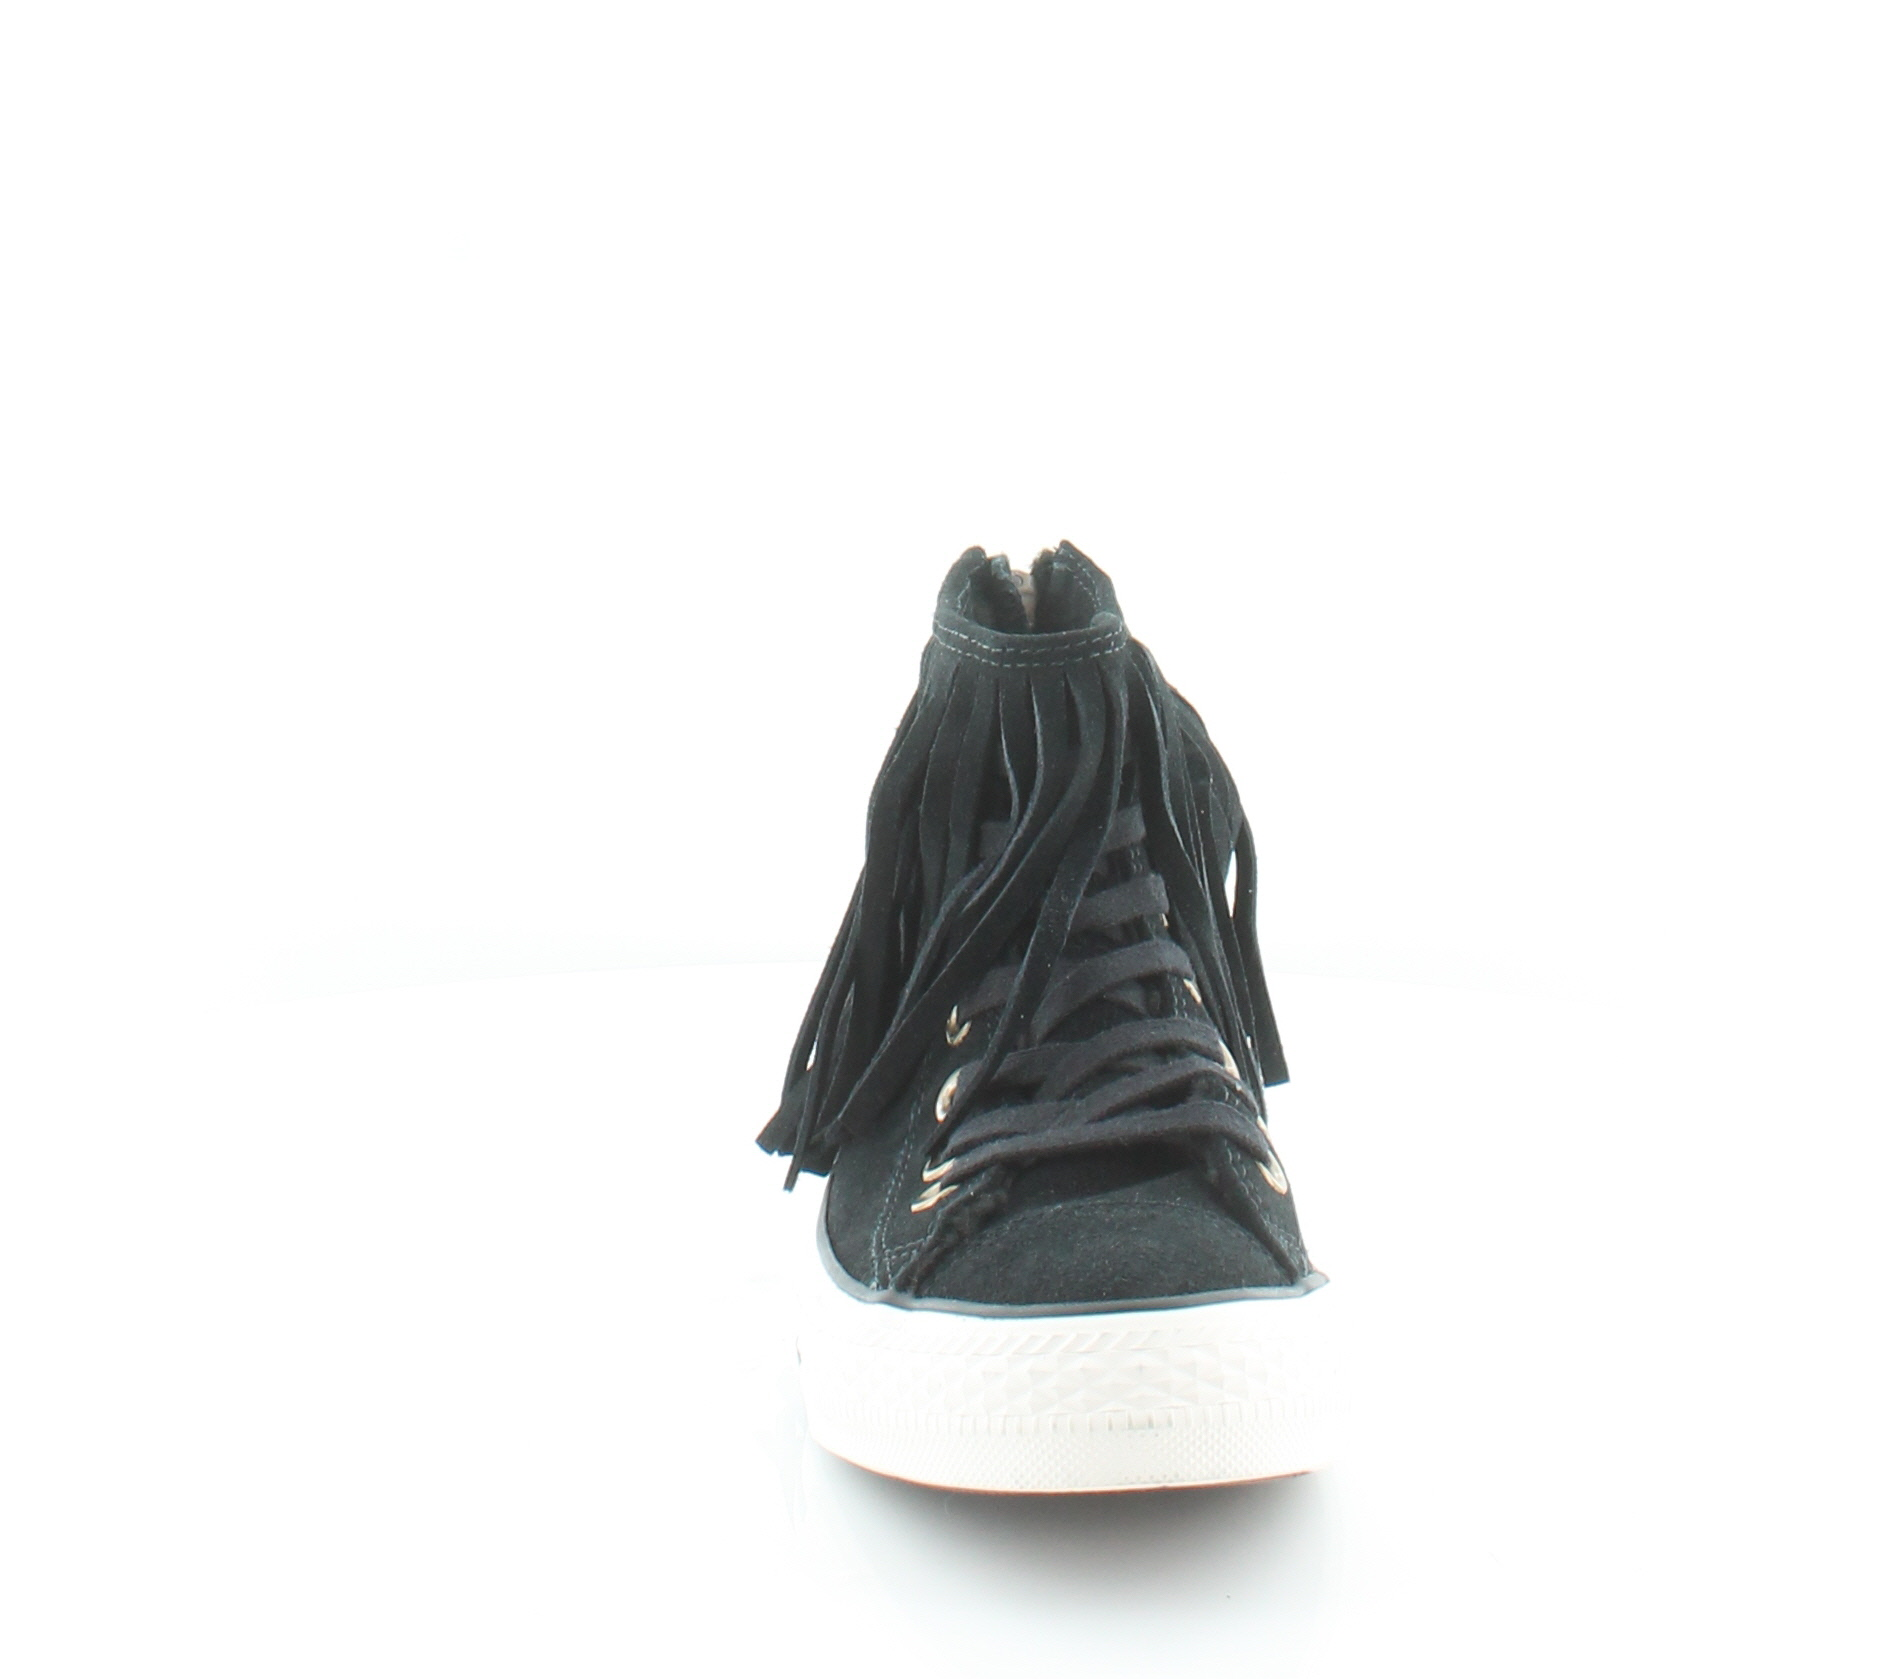 Converse Fringe Women's Fashion Sneakers Black Size 6 M